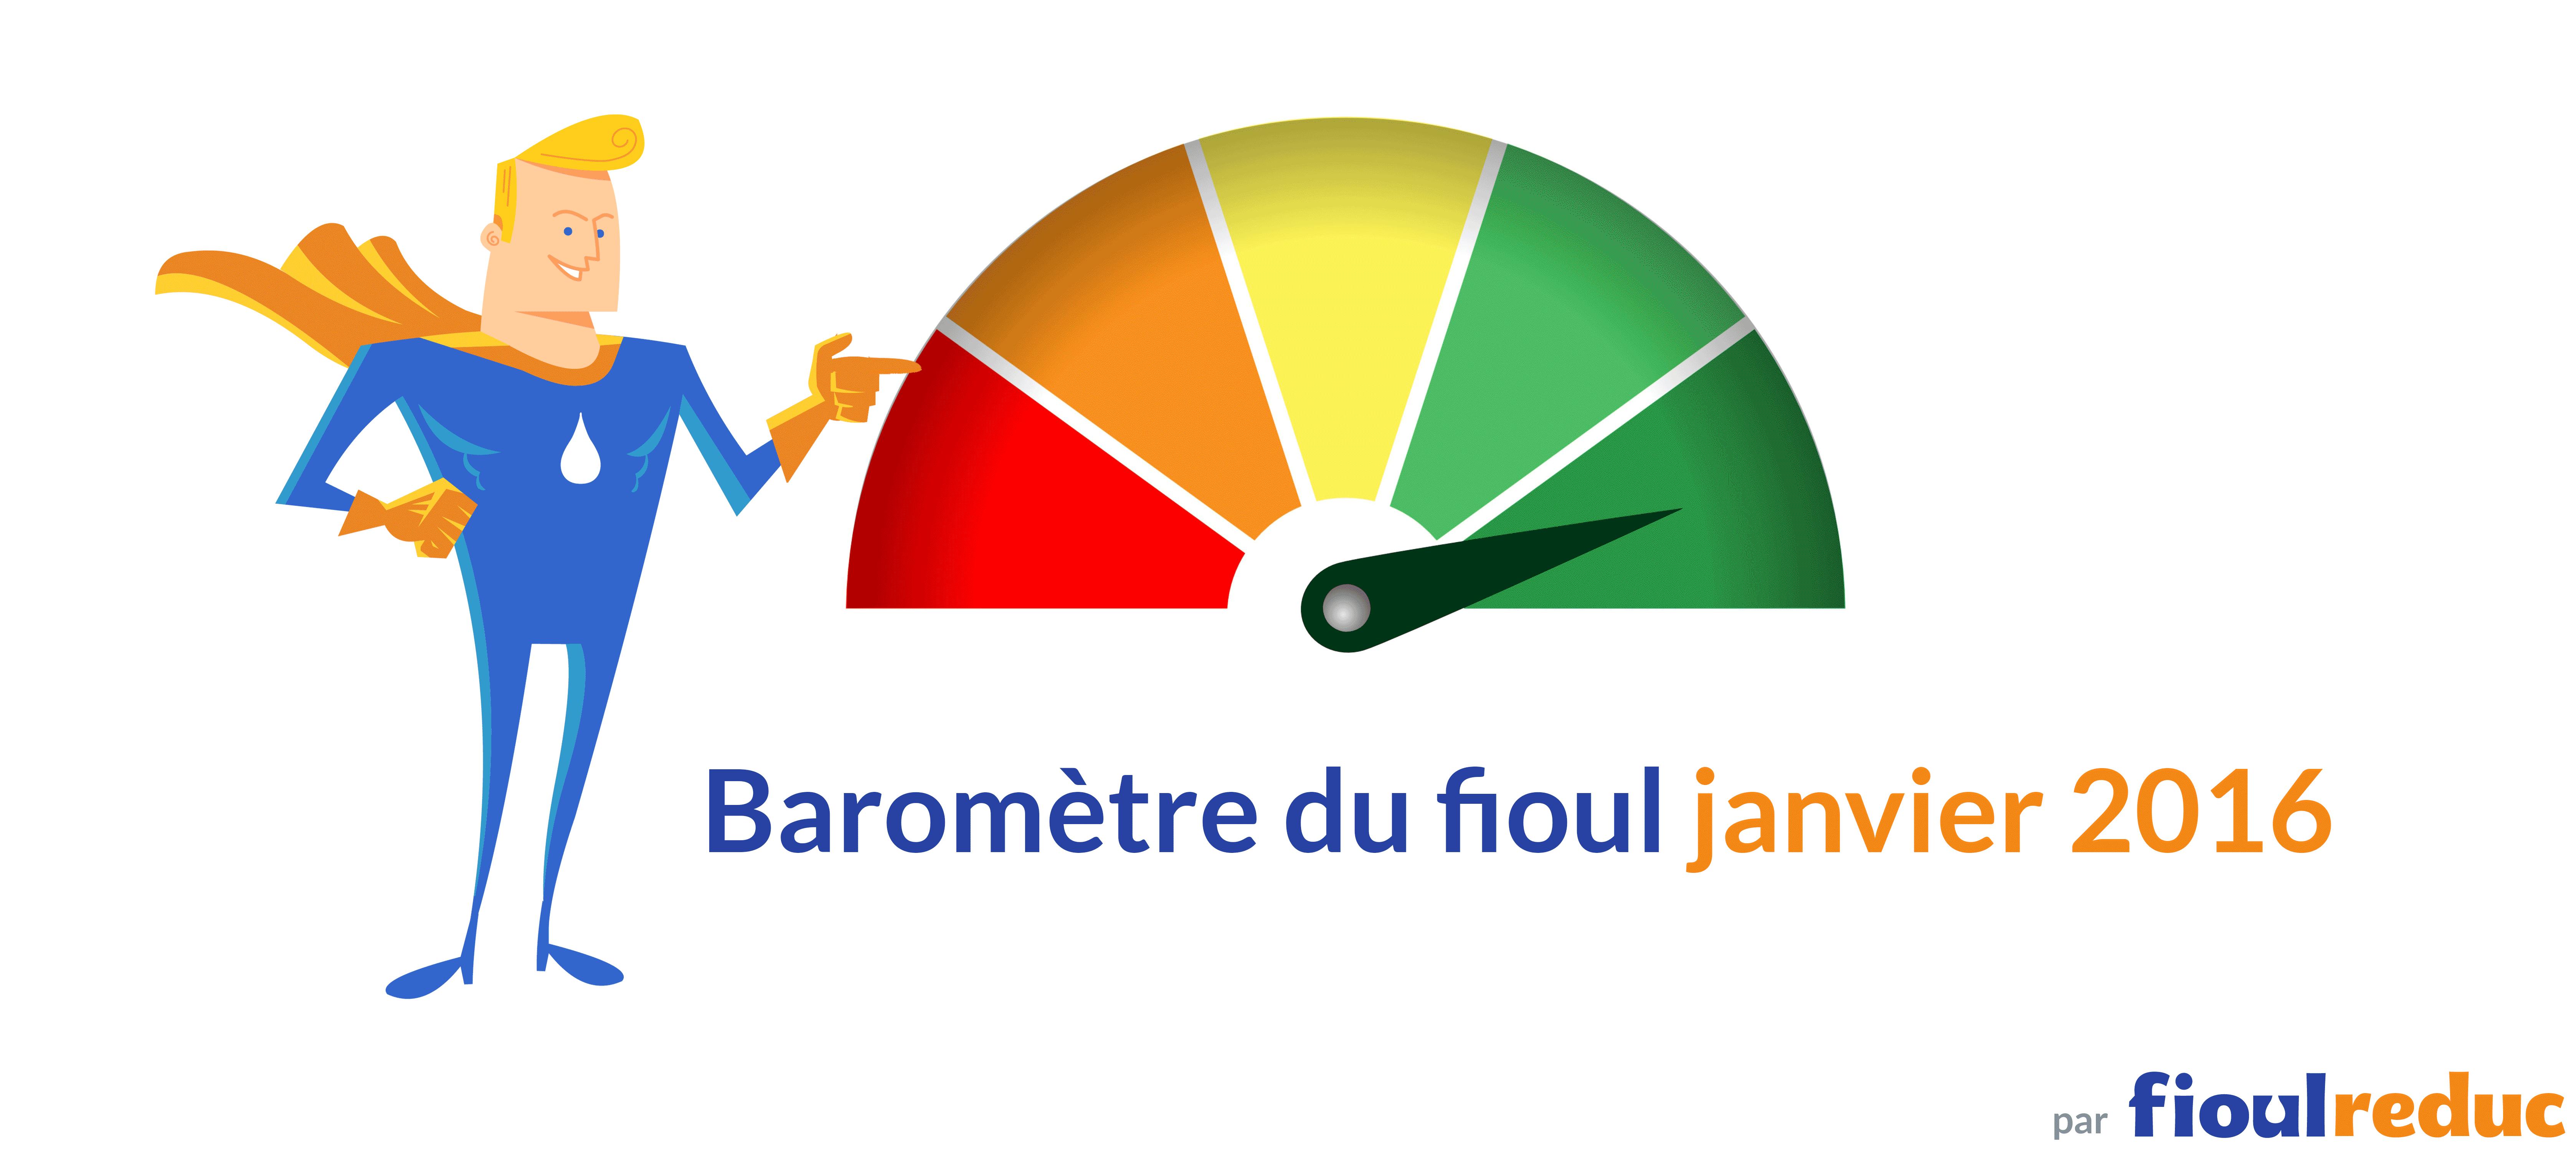 logo barometre fioul janvier 2016